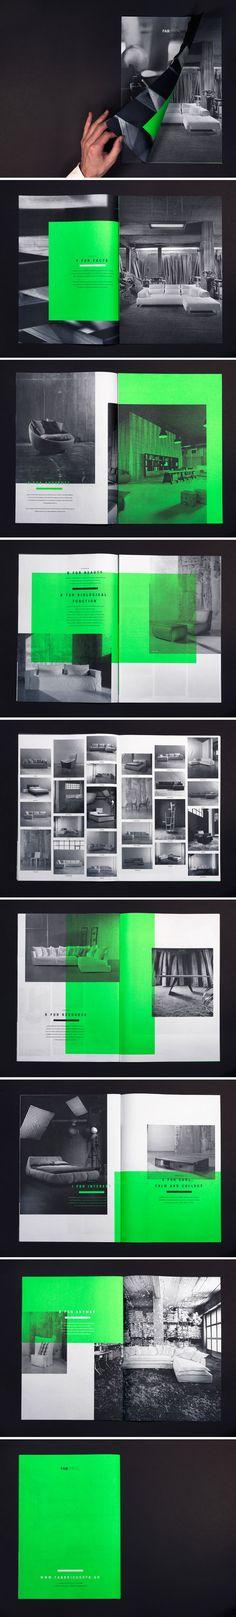 Fabrica—tion / Joshua Olsthoorn- interesting for portfolio. Maybe green is green vellum inserts?